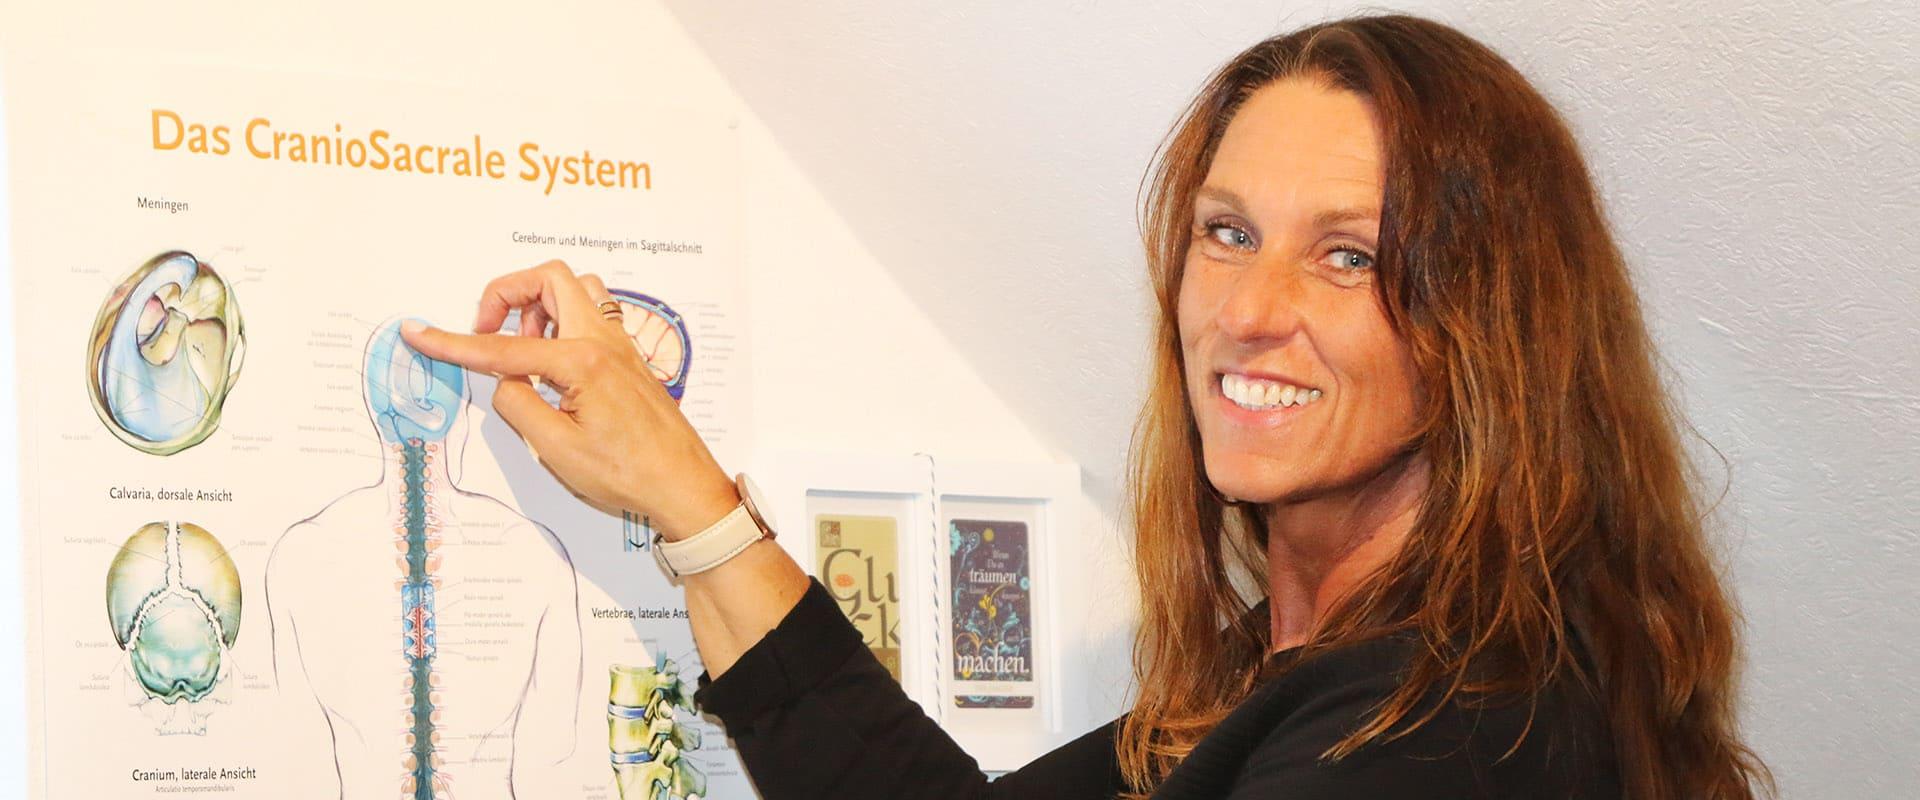 Heidi Grad Craniosacrale Koerperarbeit